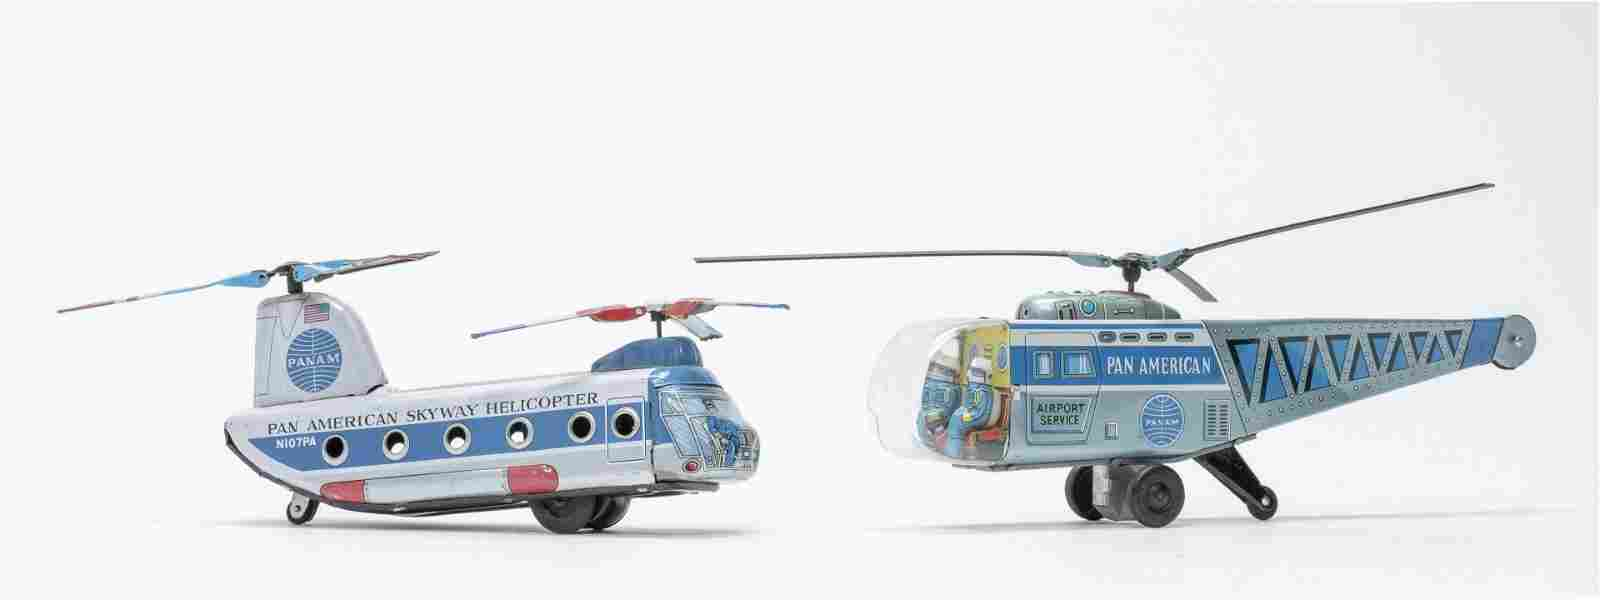 H Toy / Daiya Pan Am Helicopter Toys Rare